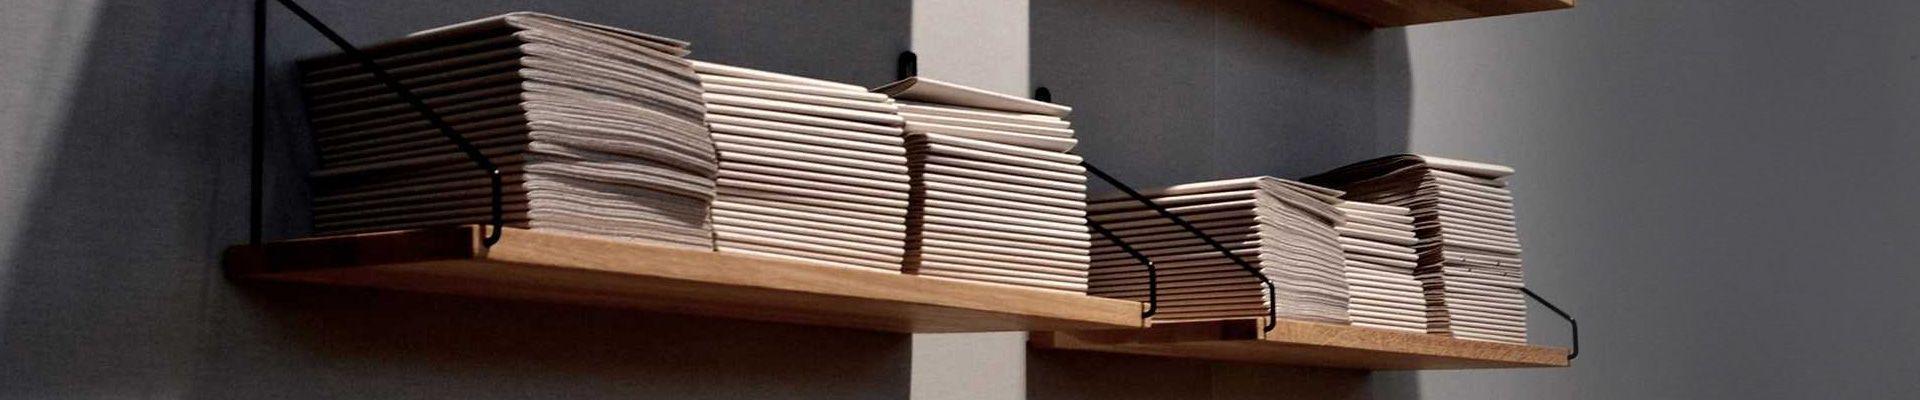 Frama Shelf